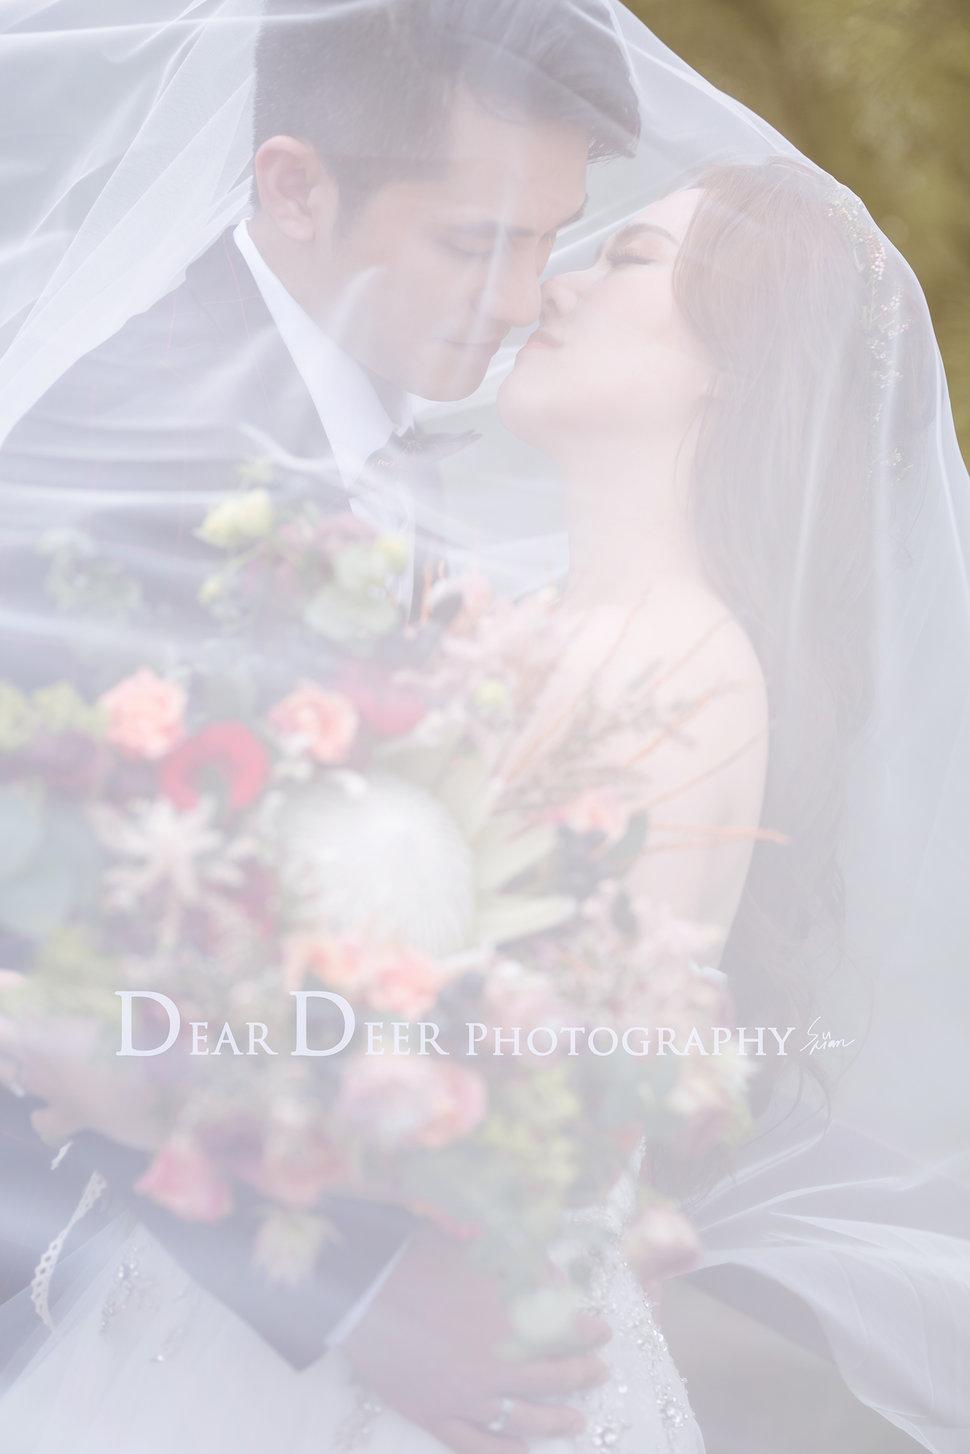 Dear Deer|花草仙女風格(編號:2155007) - Dear Deer鹿兒攝影|女攝影師蘇蔓 - 結婚吧